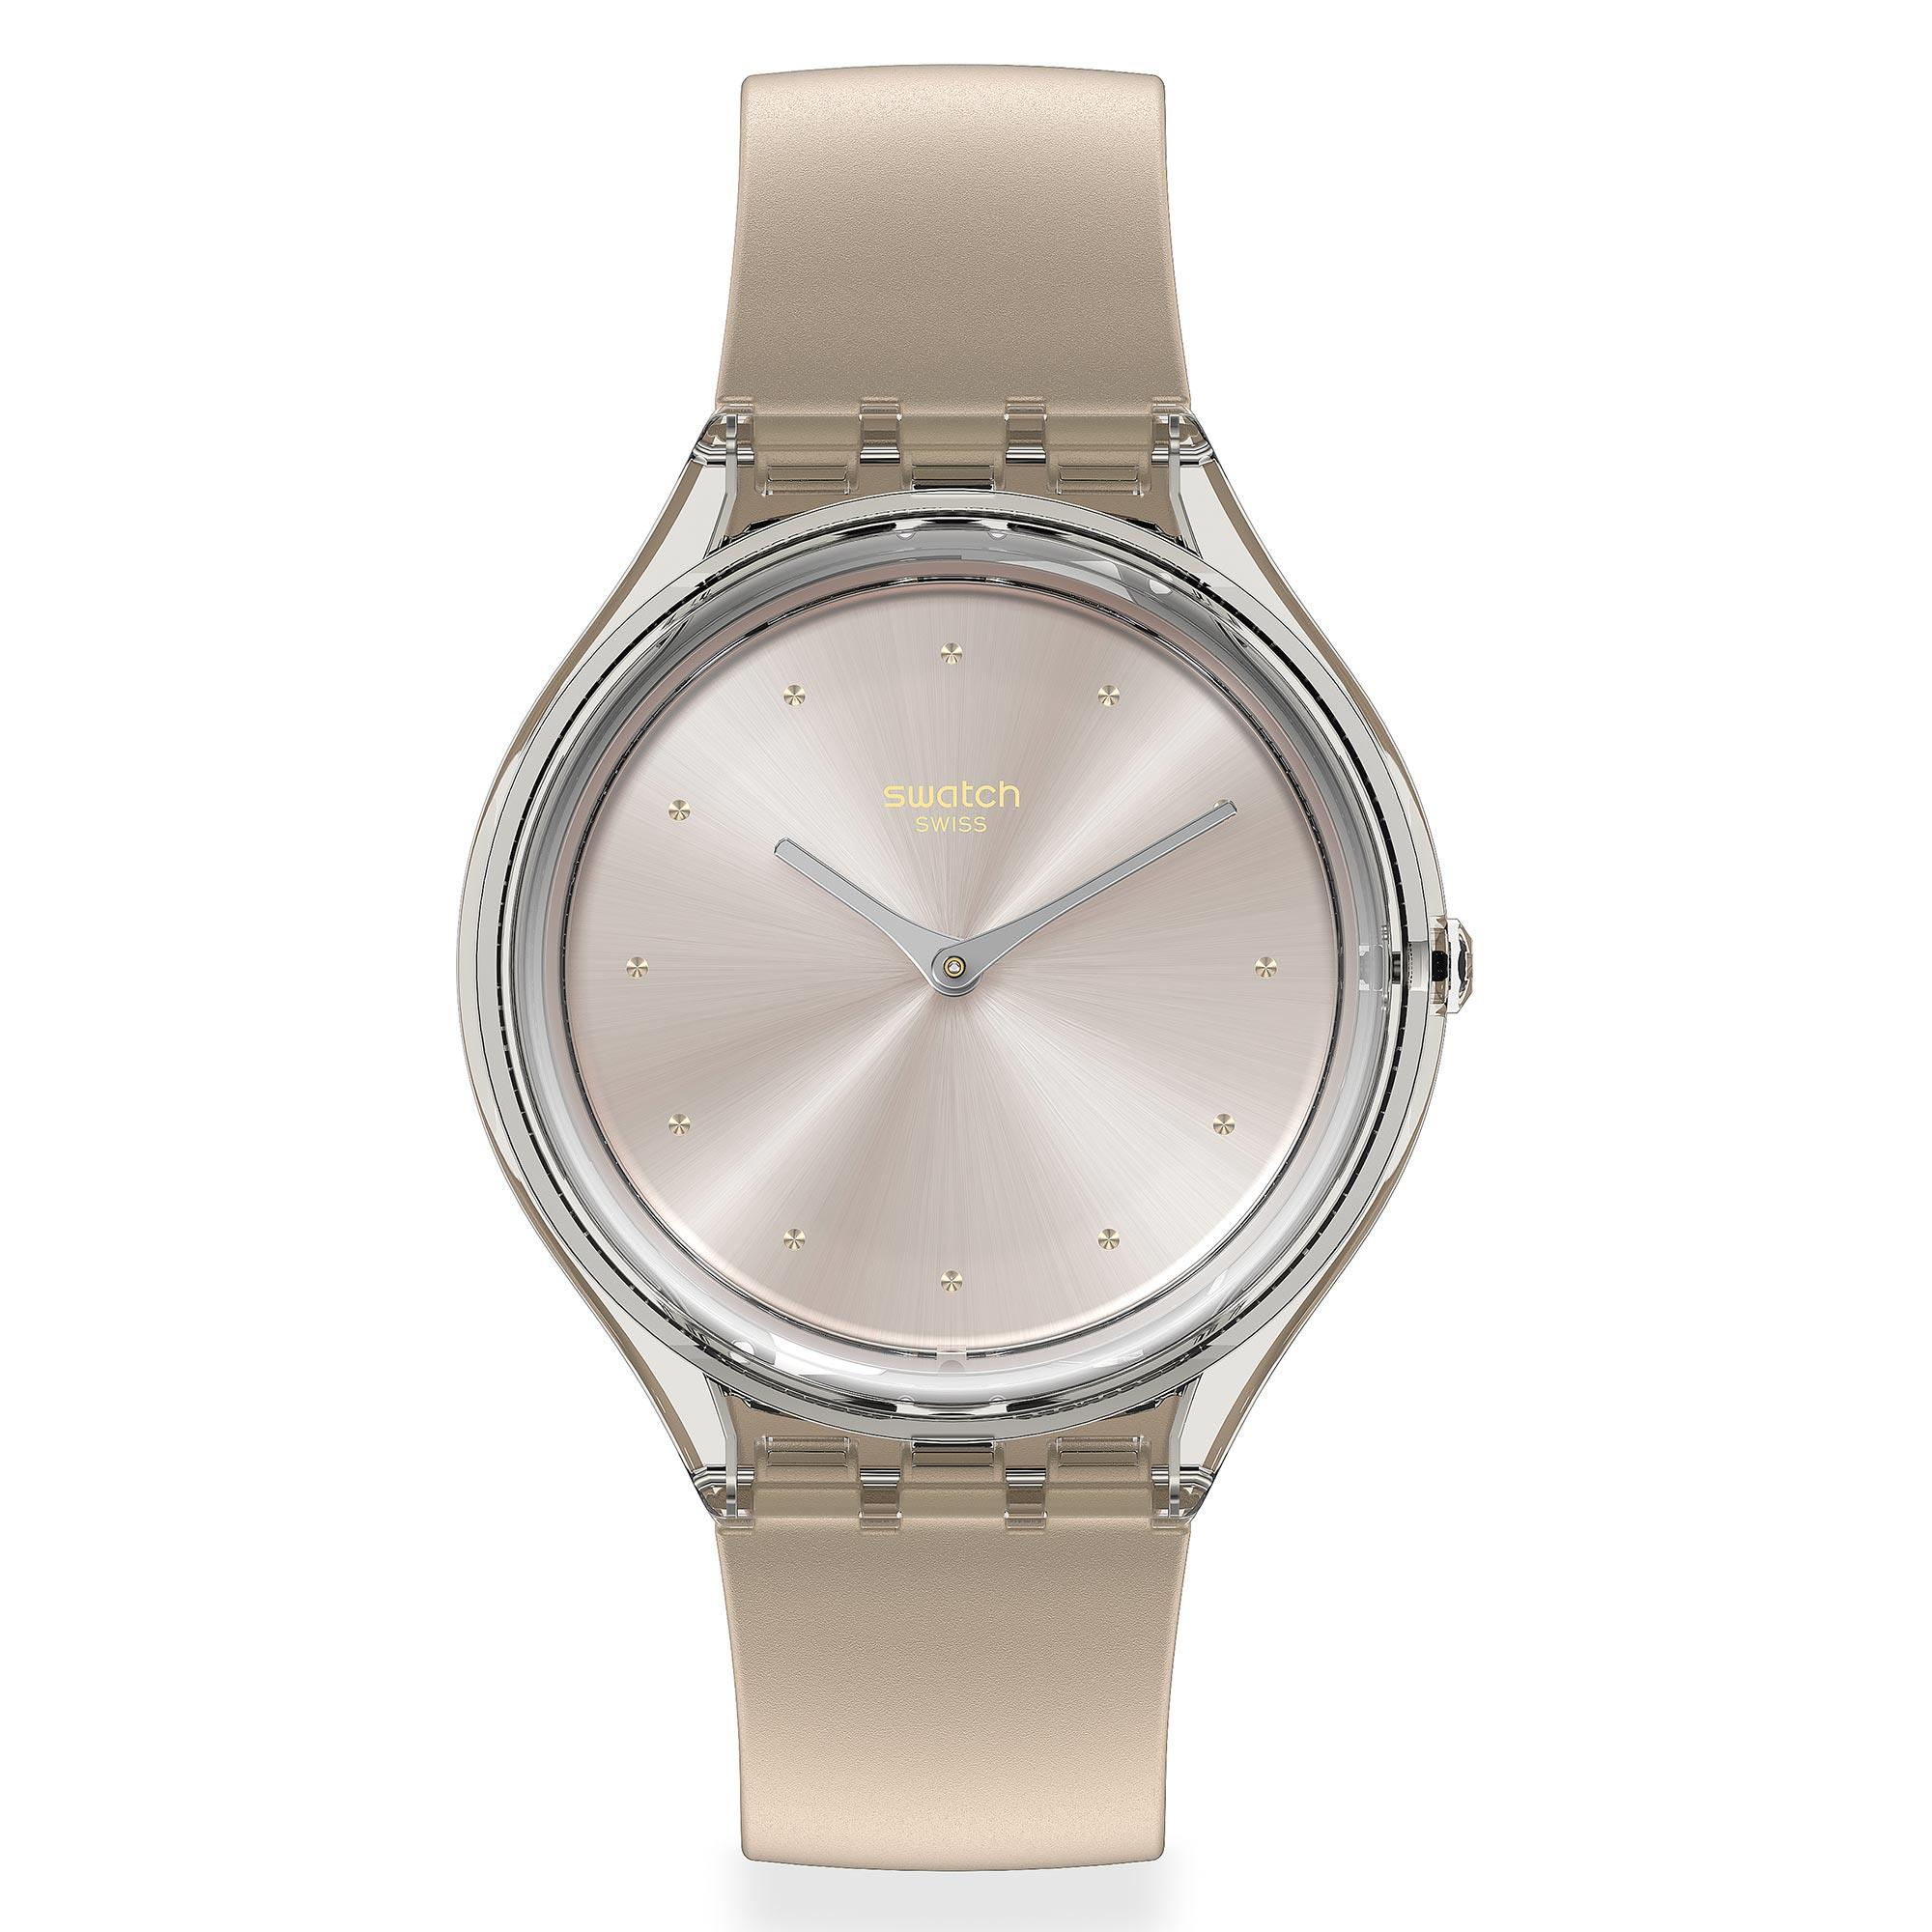 Swatch Skin Cloud Quartz Silver Dial Brown Silicone Strap Men's Watch SVOK109 RRP £85